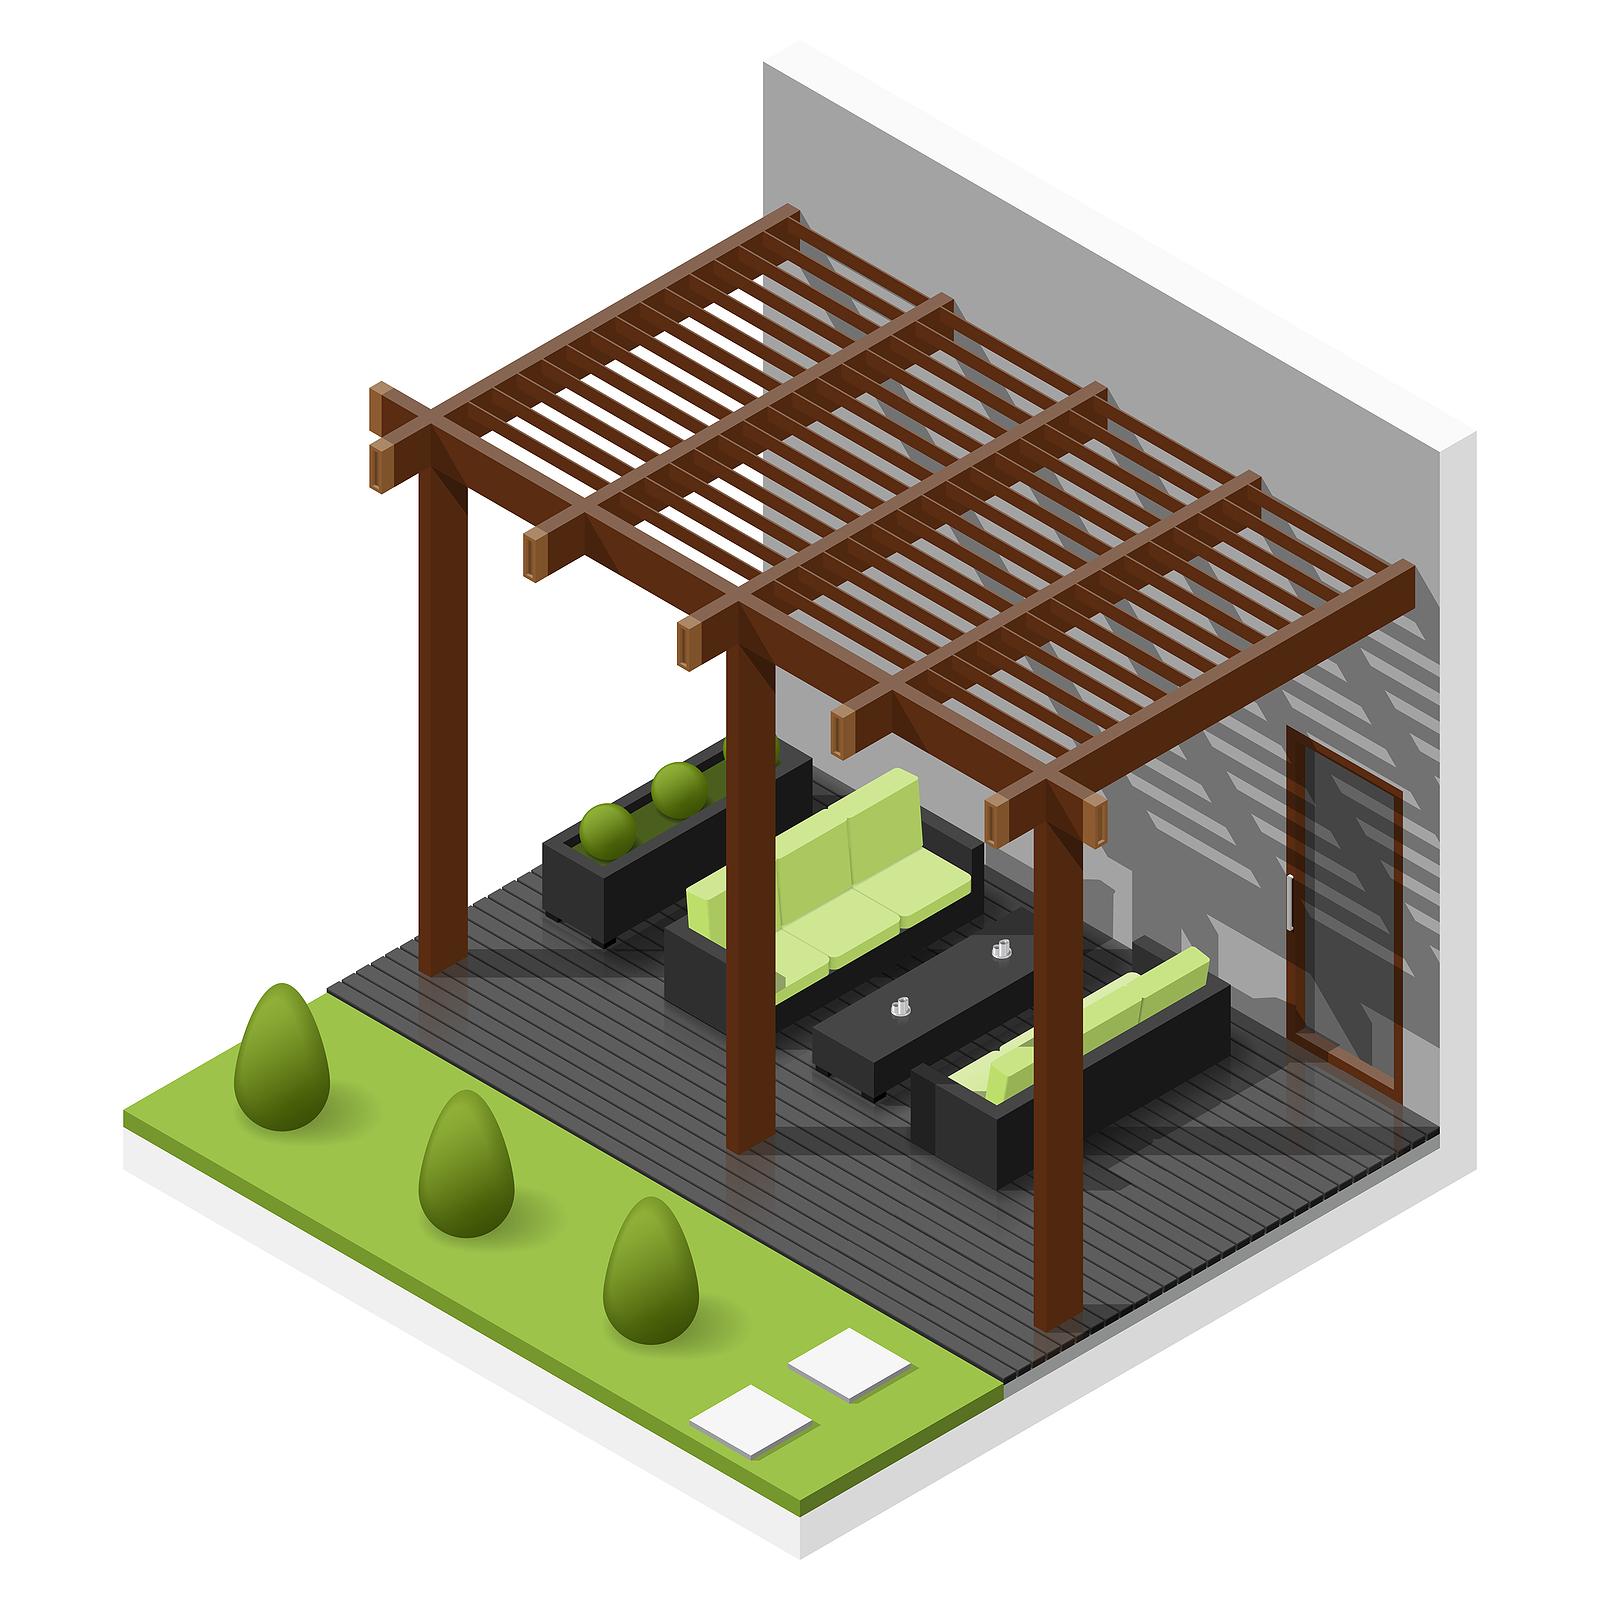 illustration of backyard relaxing gazebo outdoor space